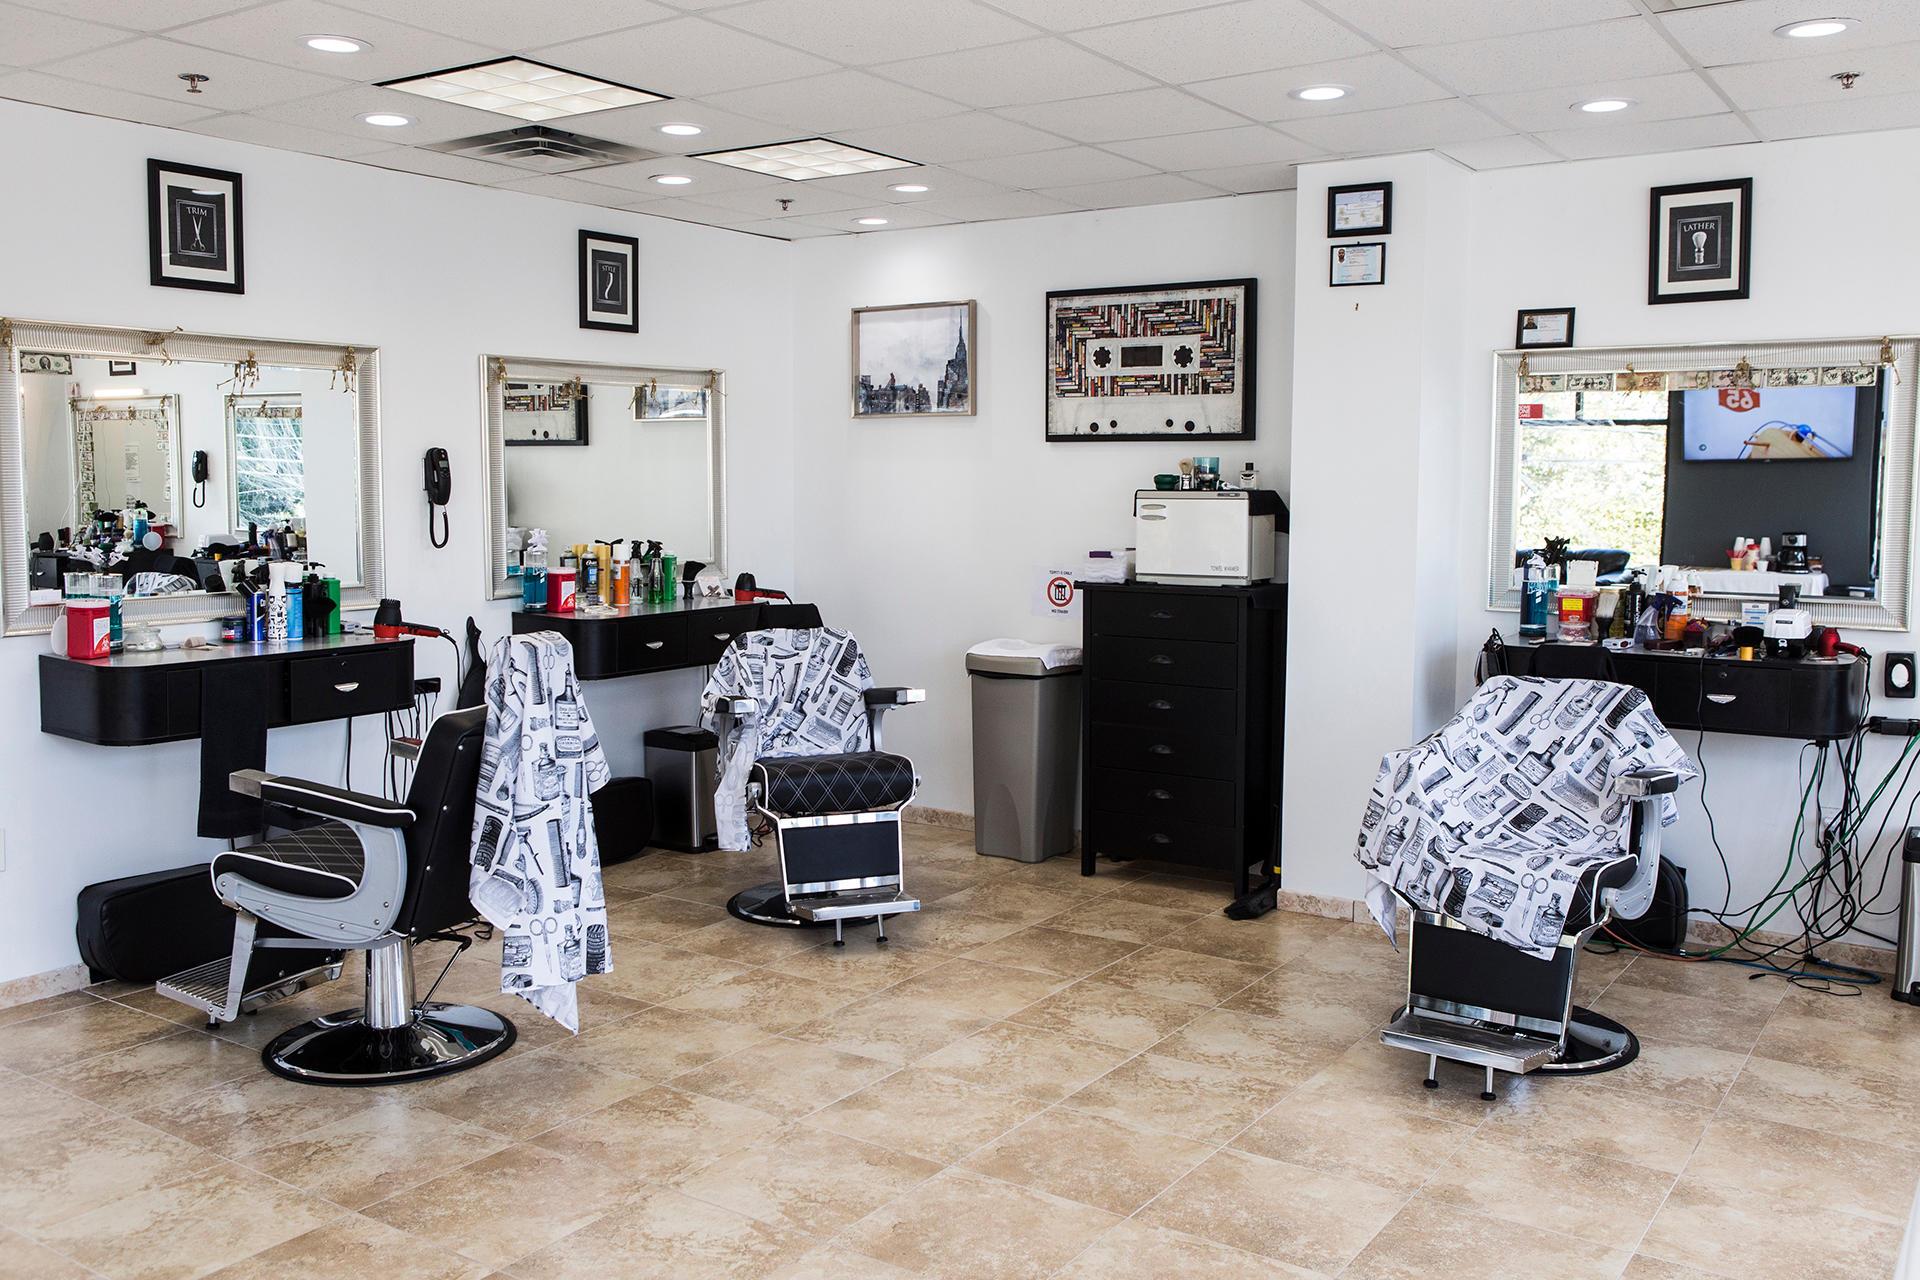 C.E.O. Barber Shop & Shave Parlor image 1